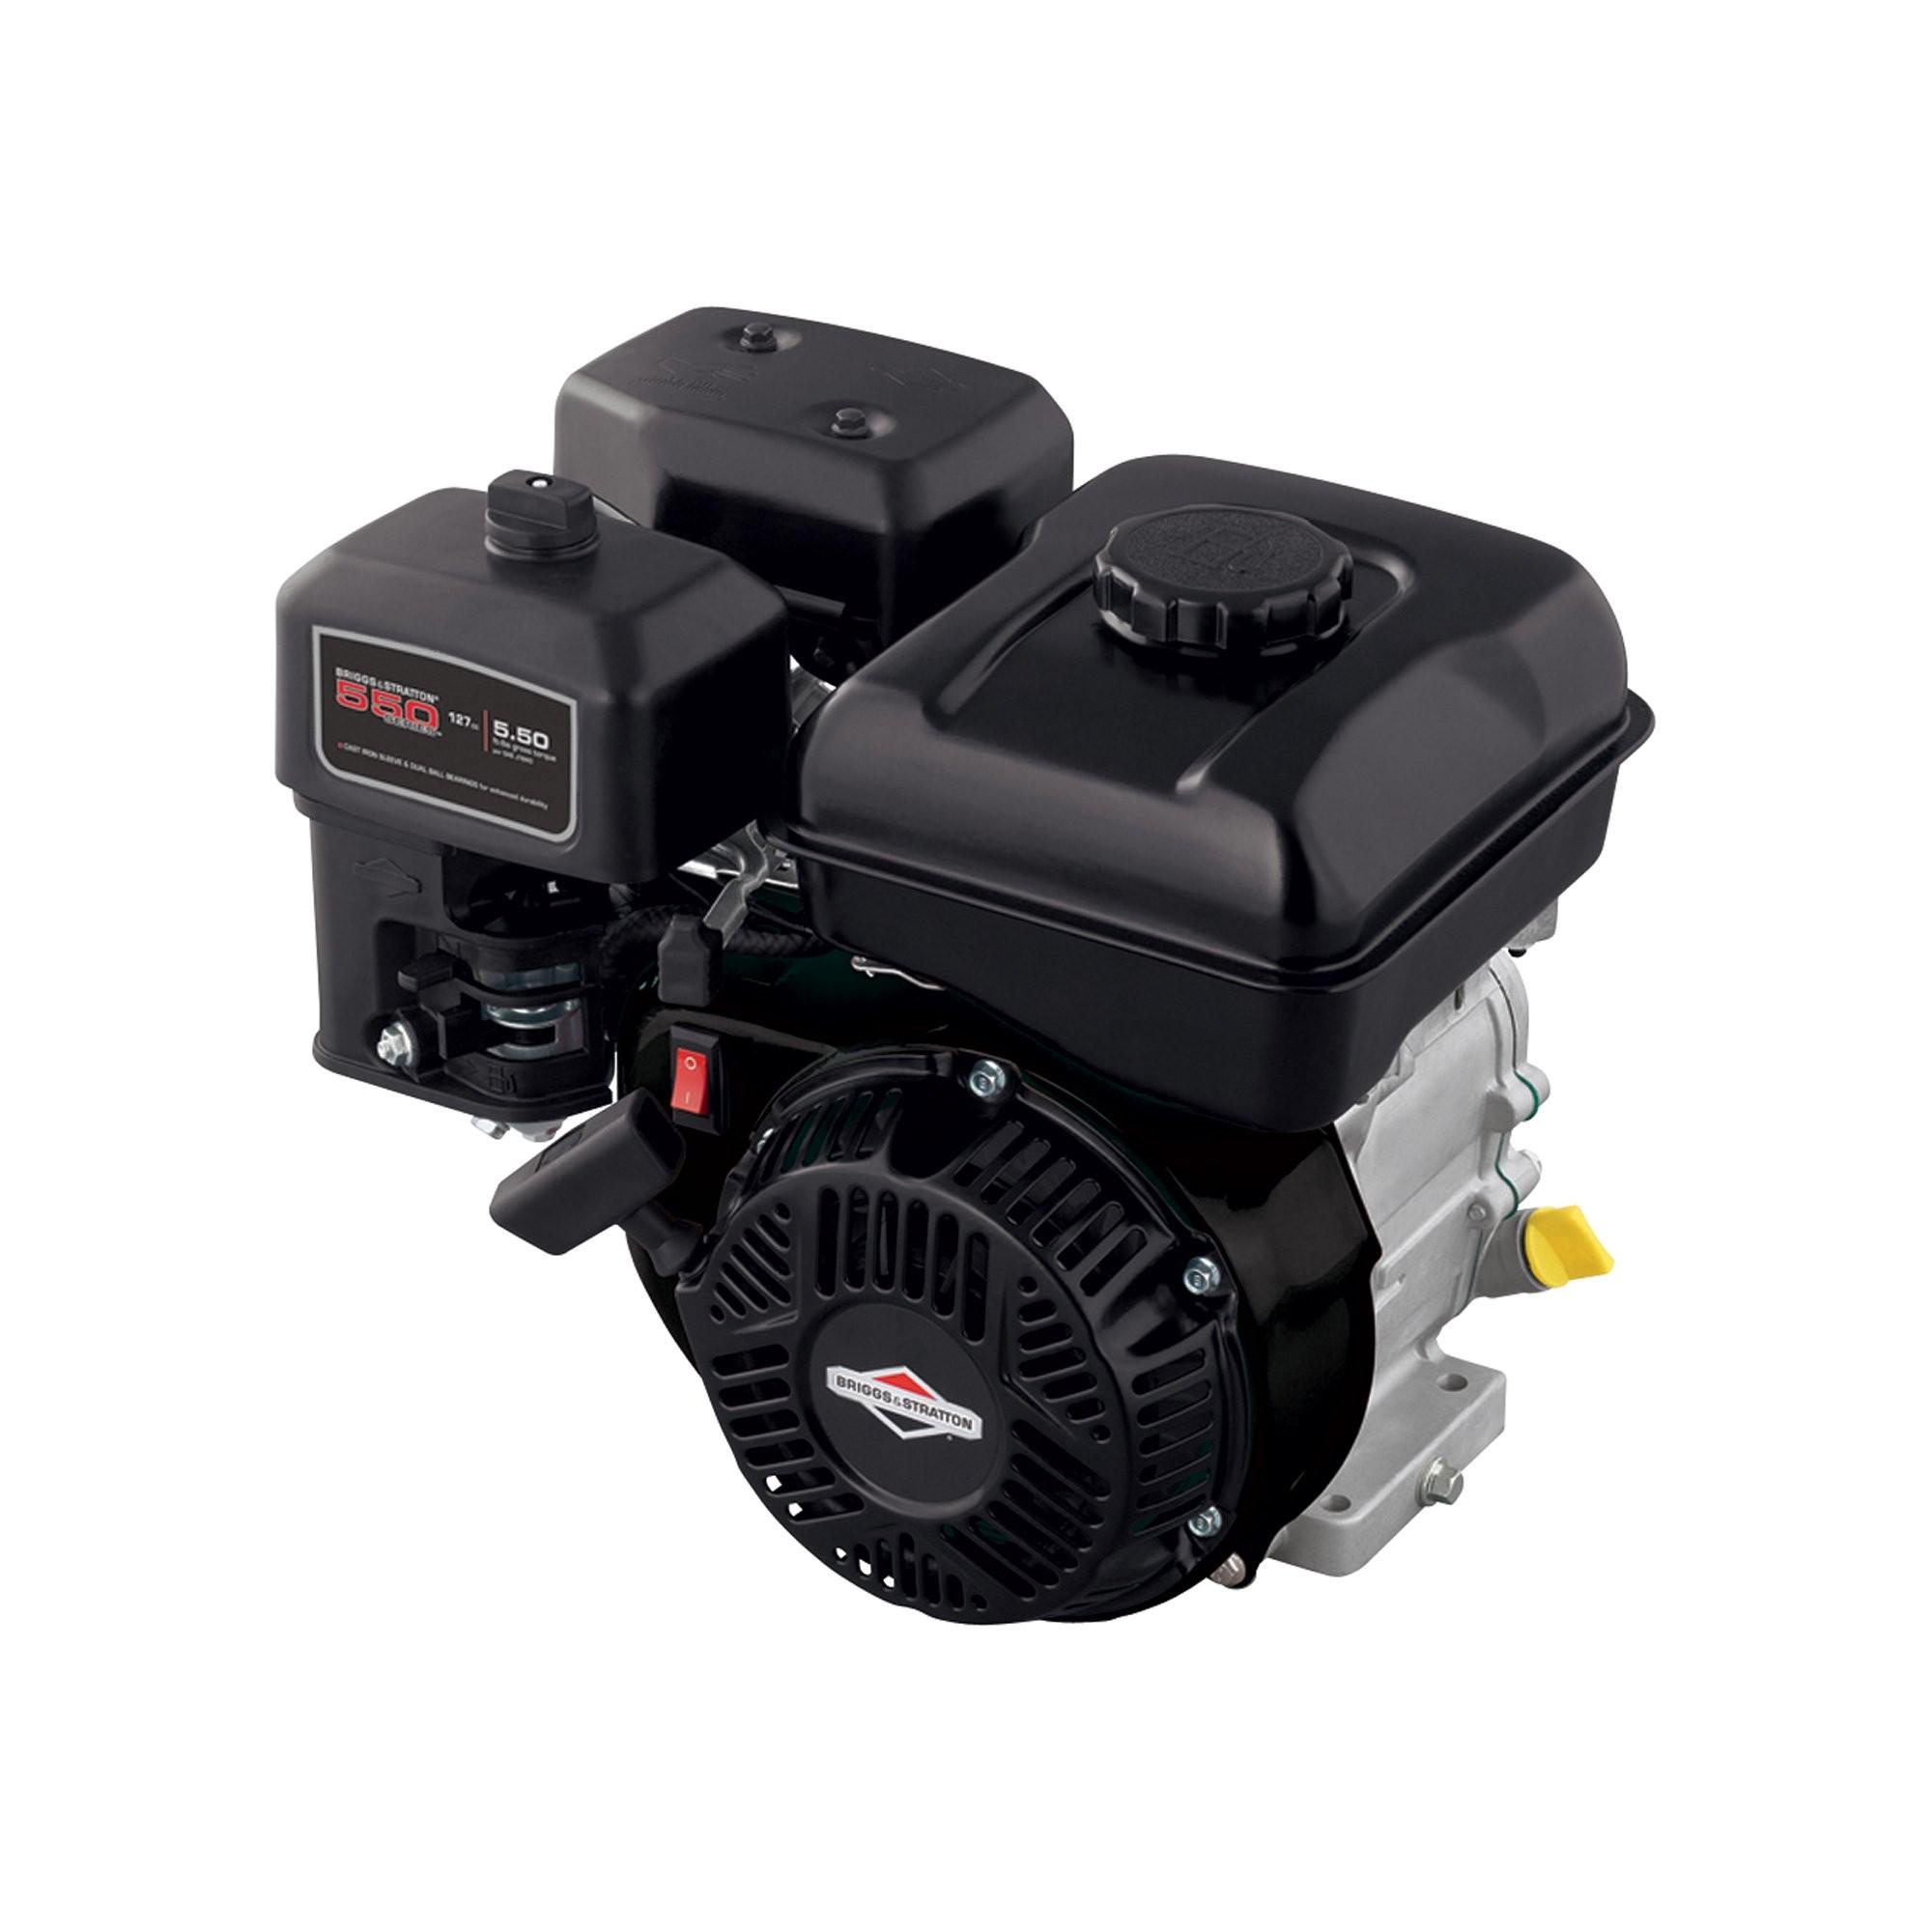 Honda 5 5 Hp Engine Carburetor Diagram Briggs & Stratton 550 Series Horizontal Ohv Engine — 127cc 5 8in X Of Honda 5 5 Hp Engine Carburetor Diagram